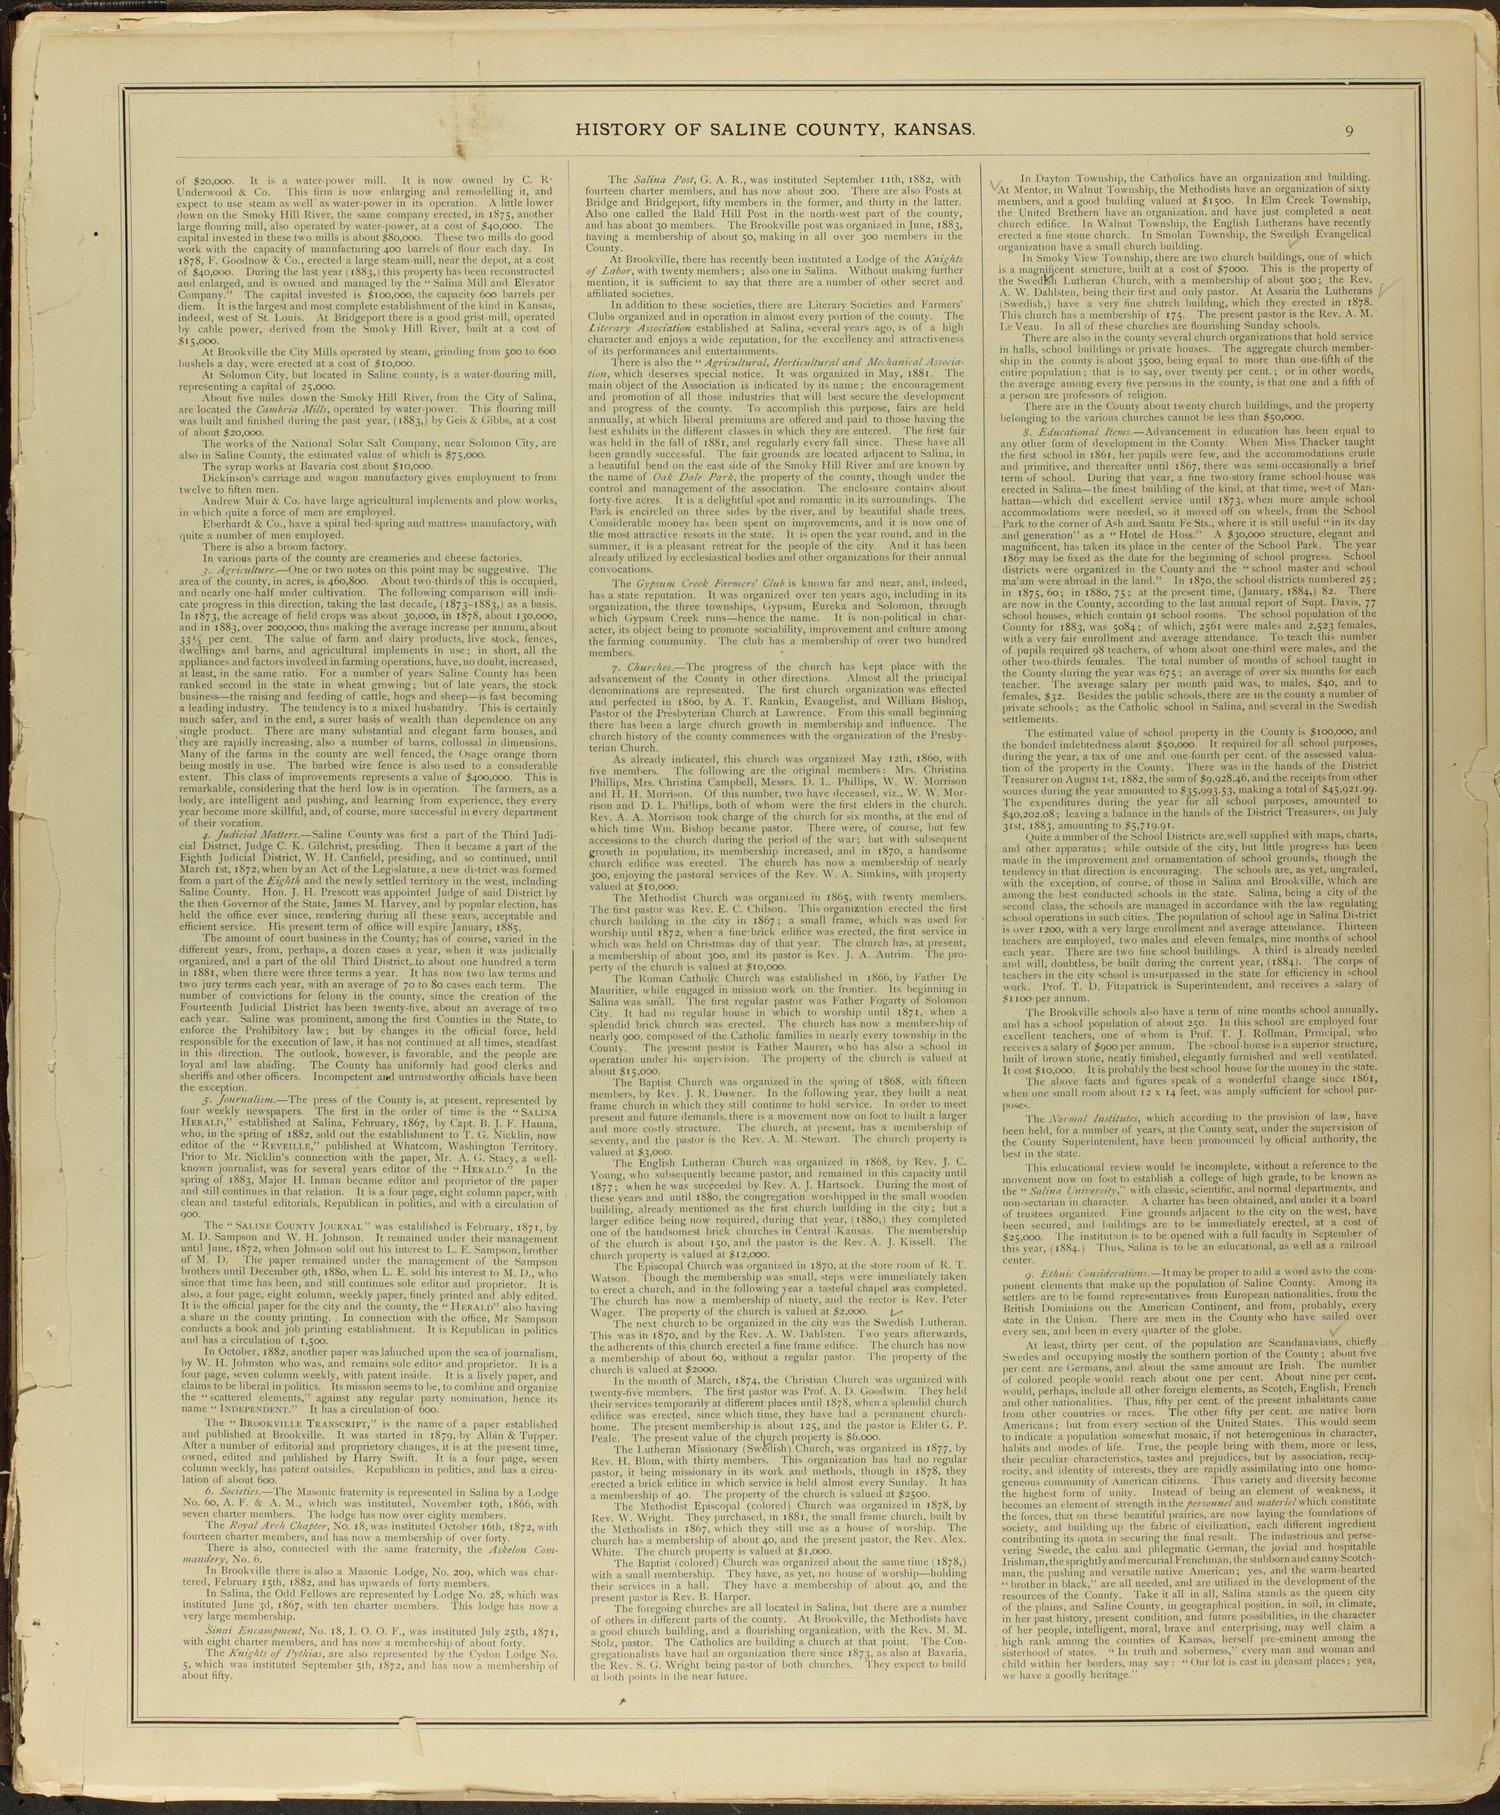 Edwards' Atlas of Saline Co., Kansas - 9